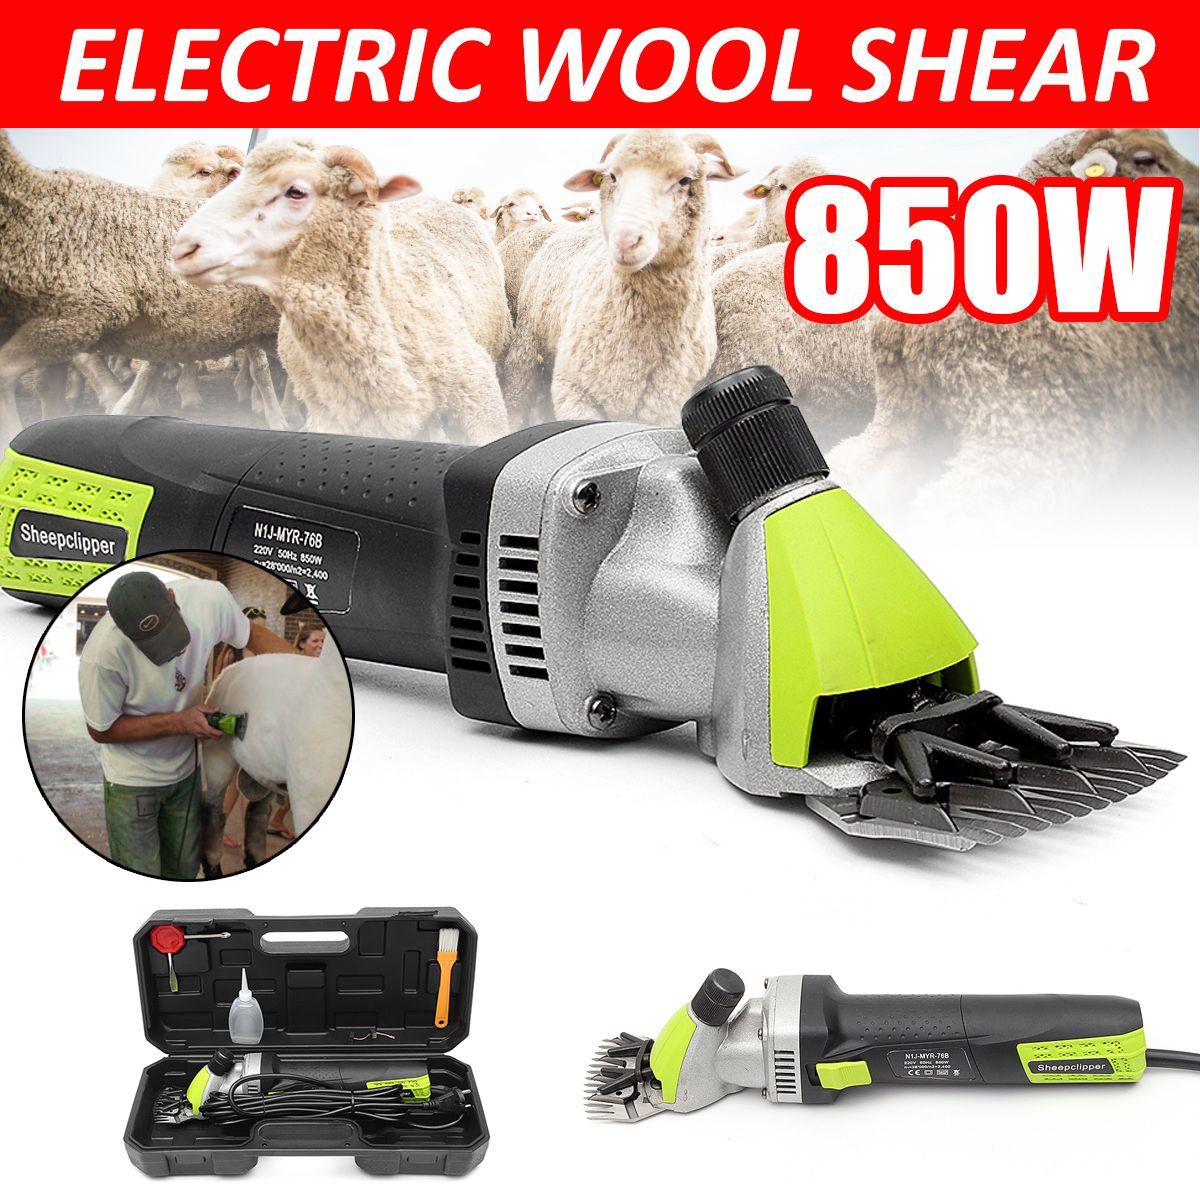 220V 850W Electric Wool Shearing Supplies Sheep Goats Clipper Farm Animal Electric Trimmer Tool for Sheep Shearing Machine